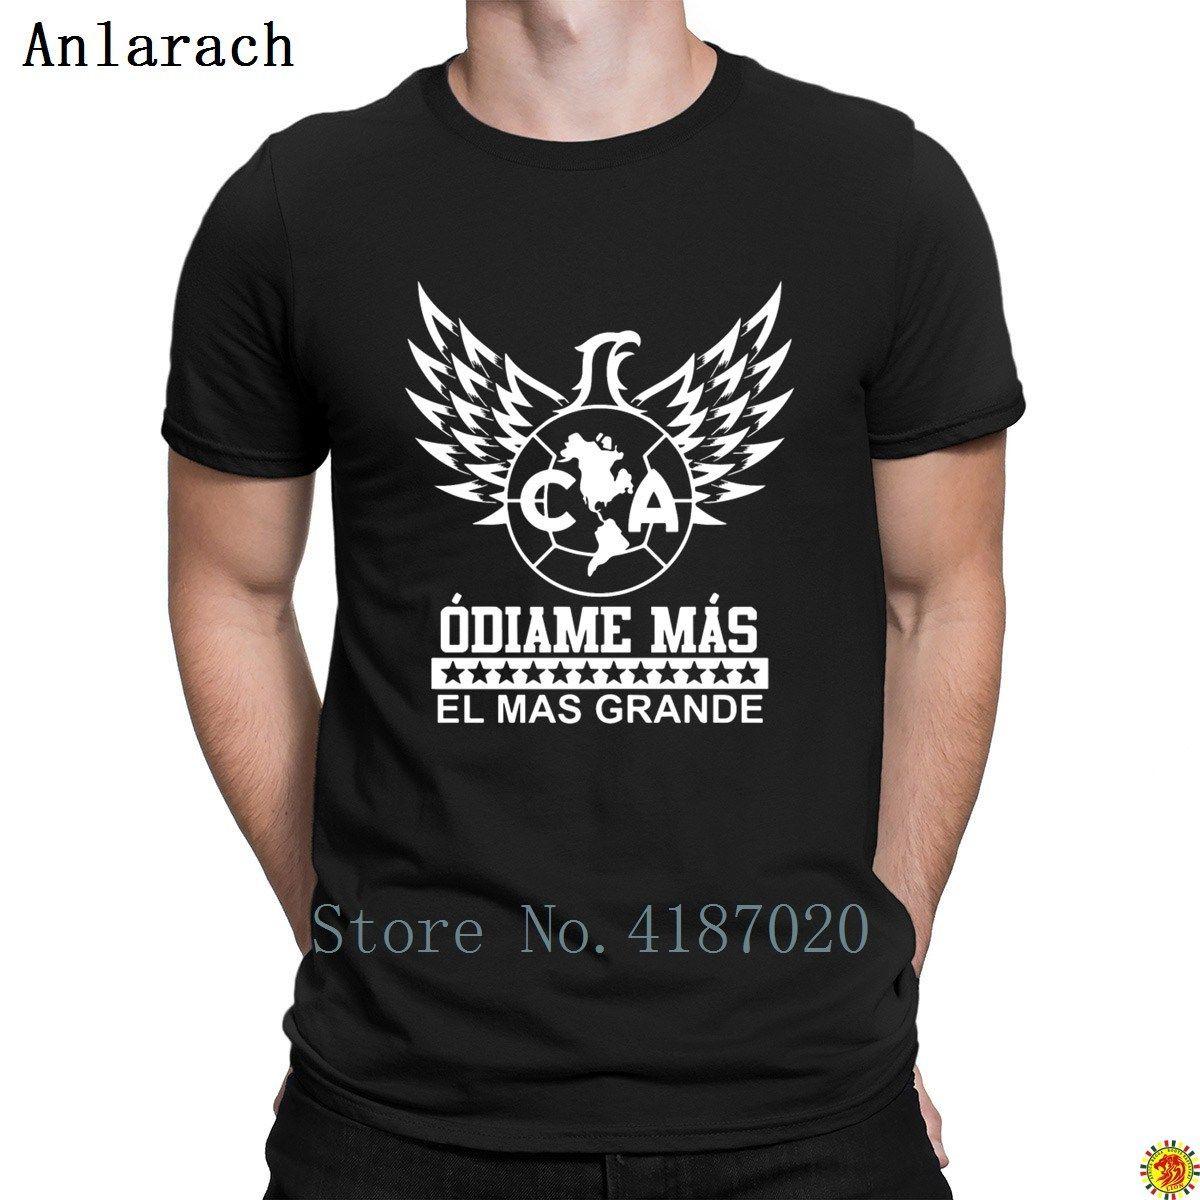 b92a9b51ce9 Club America Mexico Aguilas Camiseta Jersey Odiame Tshirt Creative Loose  Websites Men's Tshirt Summer Kawaii Cotton Tee Tops